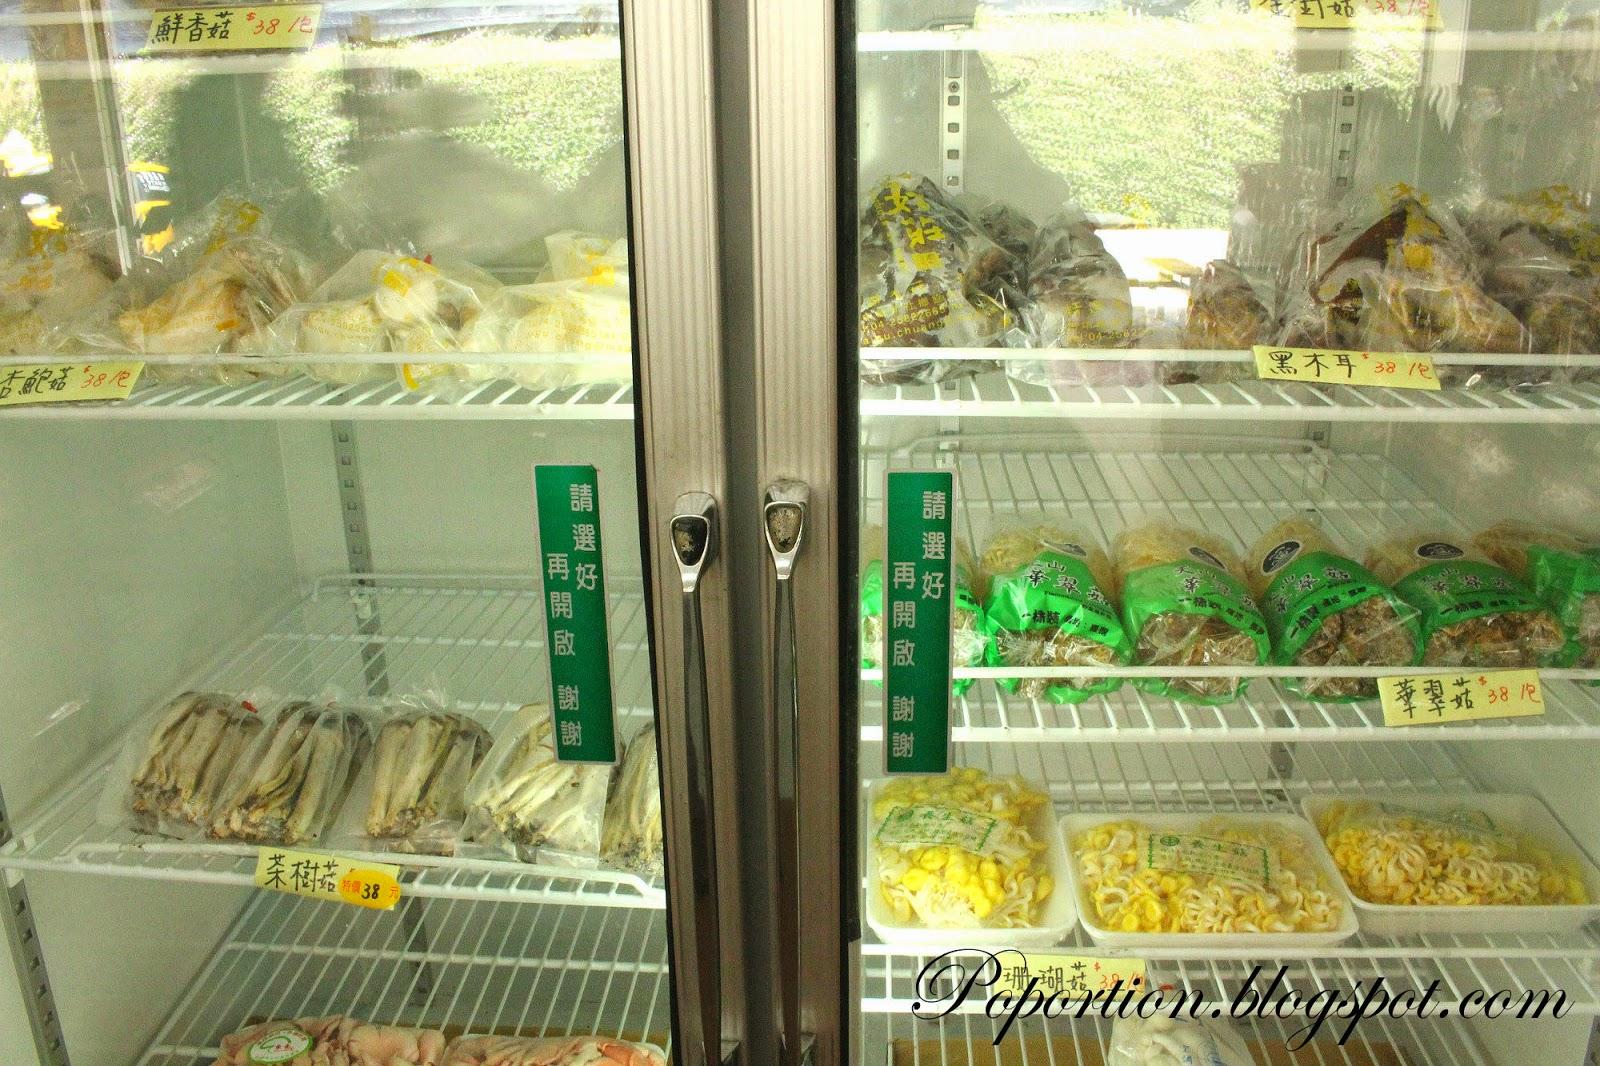 taiwan mushroom shop